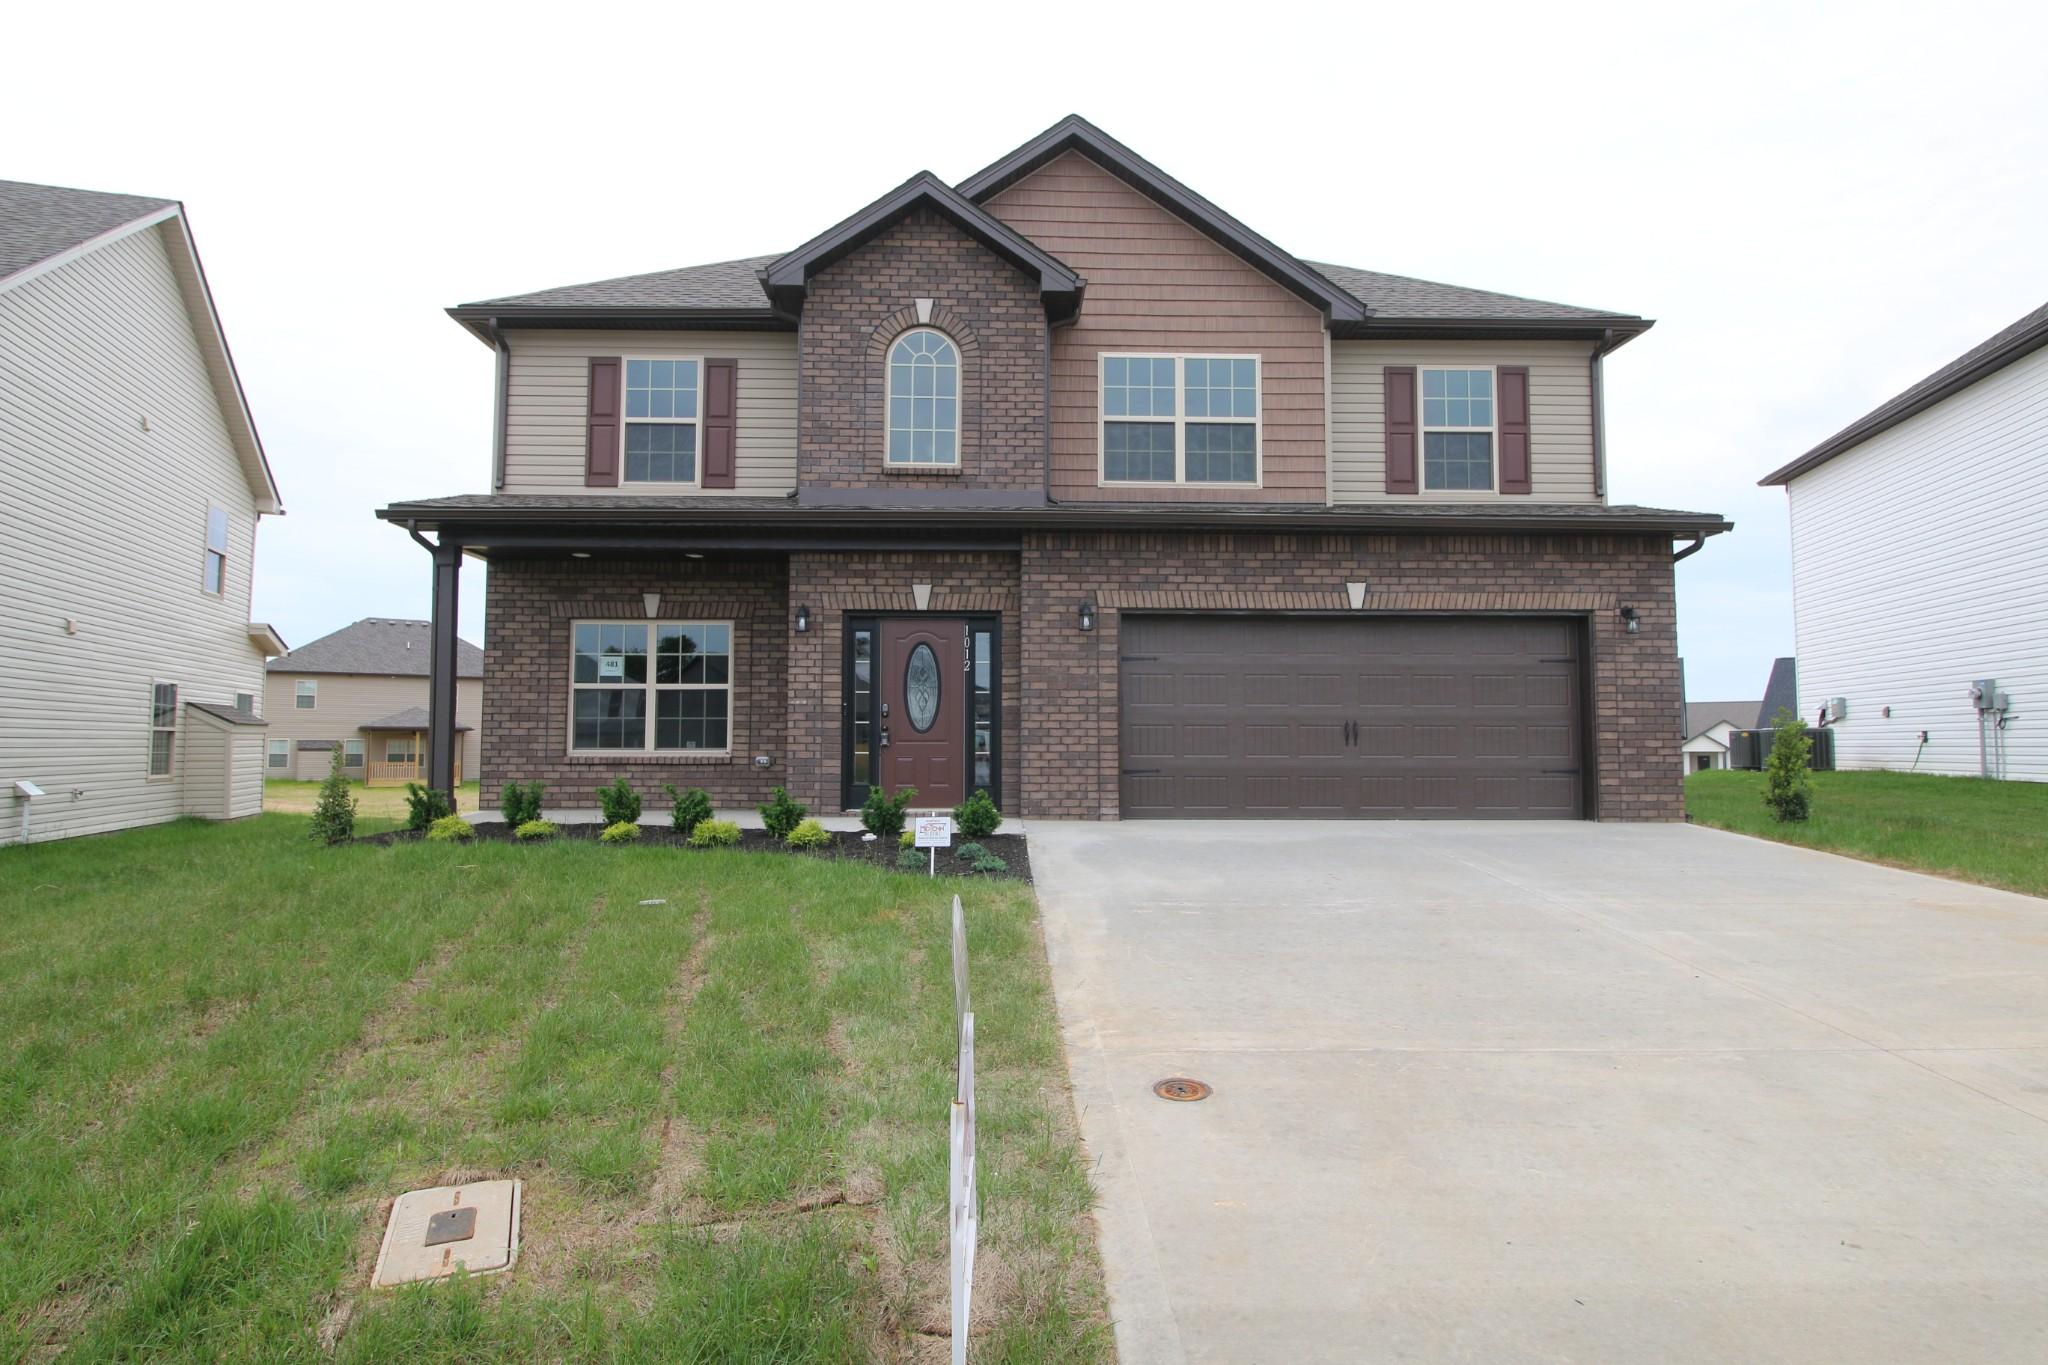 481 Autumn Creek Property Photo - Clarksville, TN real estate listing